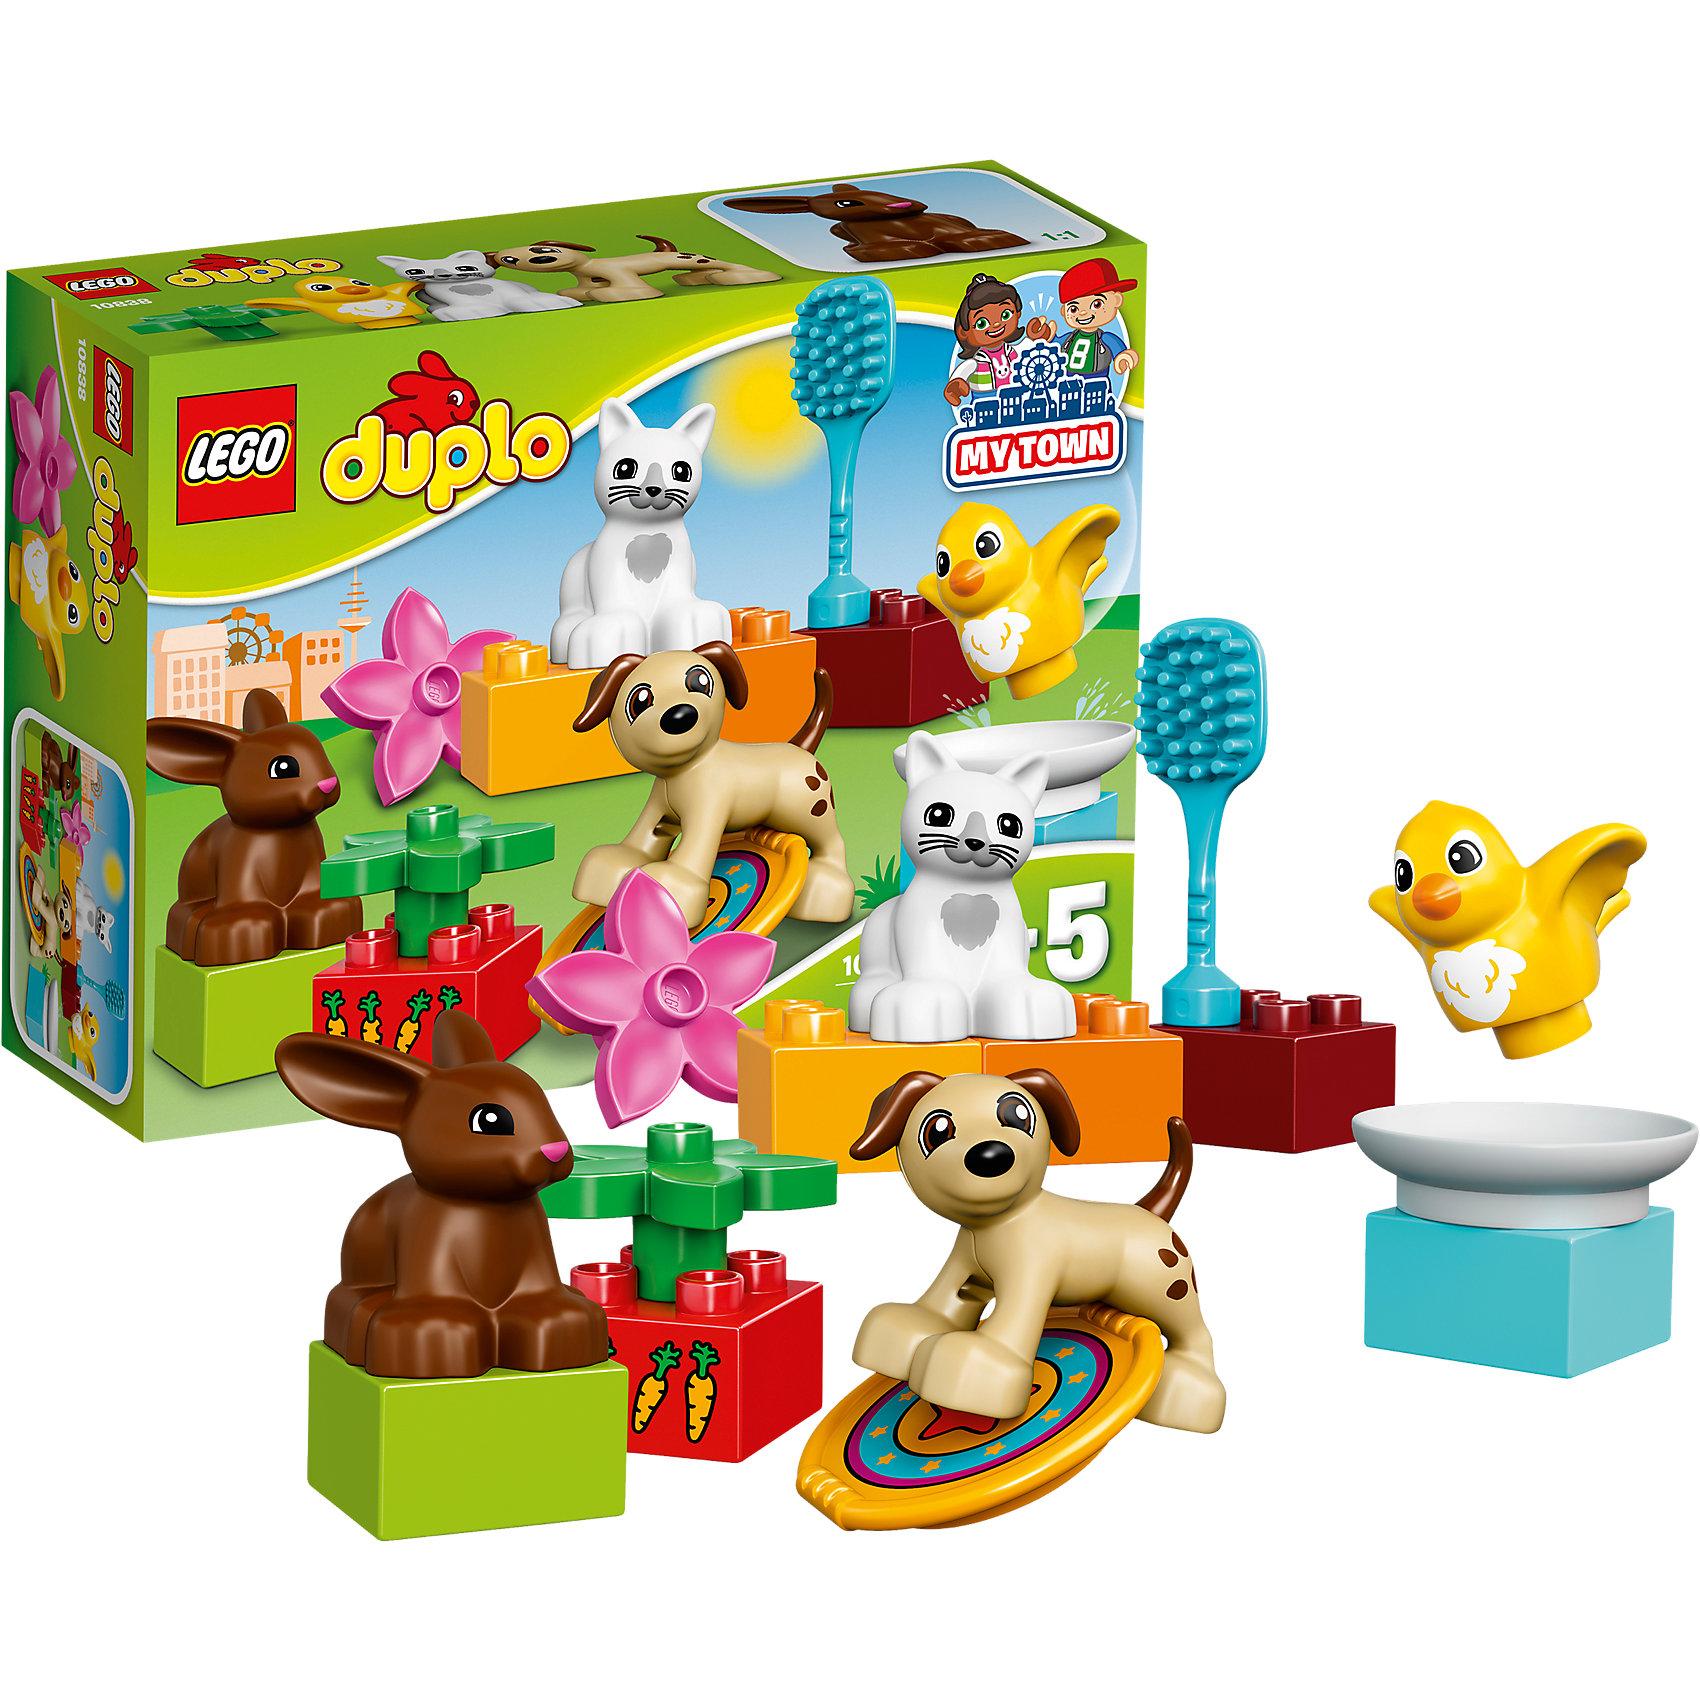 LEGO DUPLO 10838: Домашние животные<br><br>Ширина мм: 191<br>Глубина мм: 61<br>Высота мм: 141<br>Вес г: 146<br>Возраст от месяцев: 24<br>Возраст до месяцев: 60<br>Пол: Унисекс<br>Возраст: Детский<br>SKU: 5002508